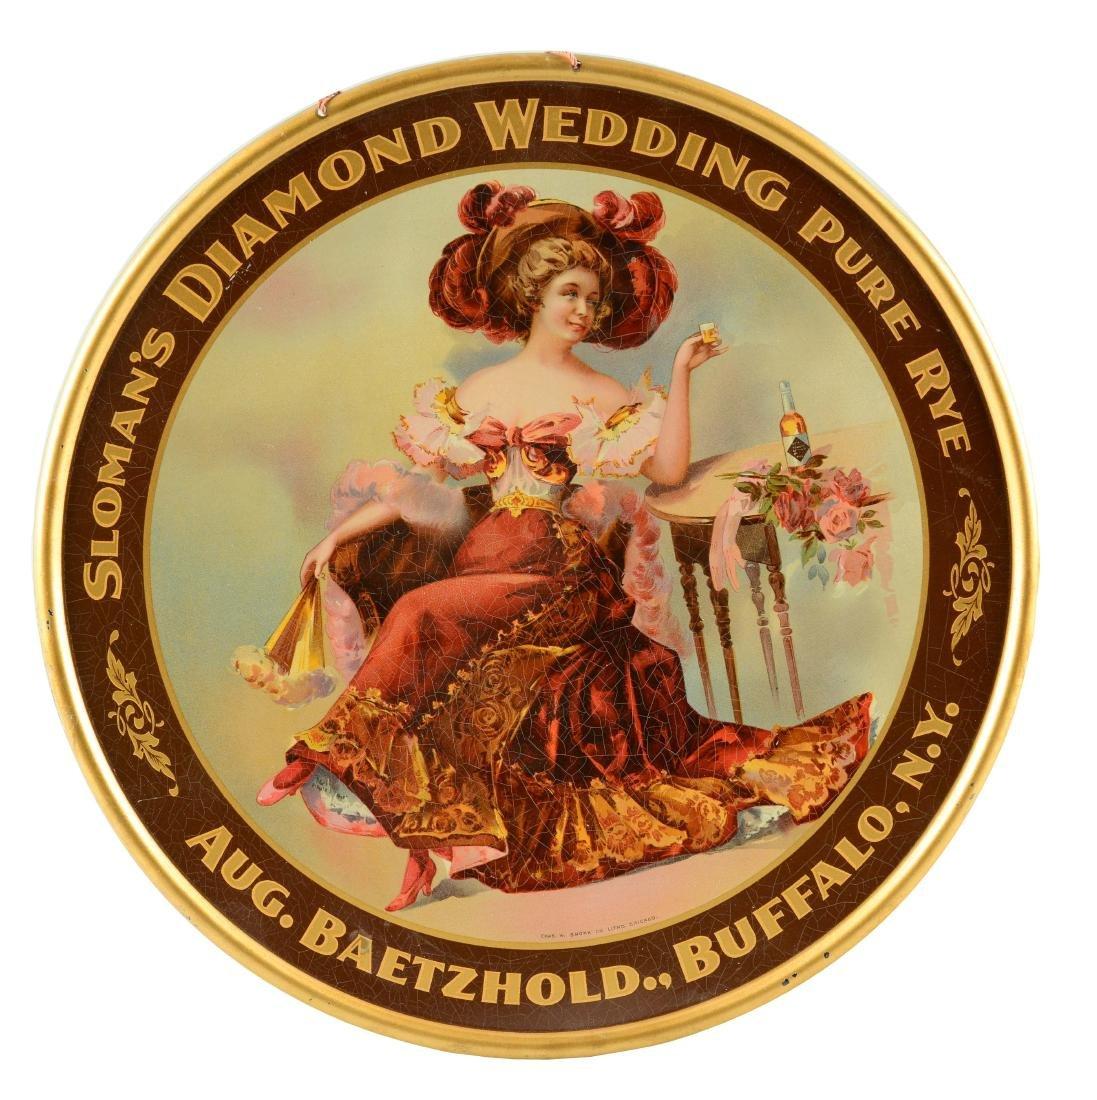 Sloman's Diamond Wedding Pure Rye Sign.